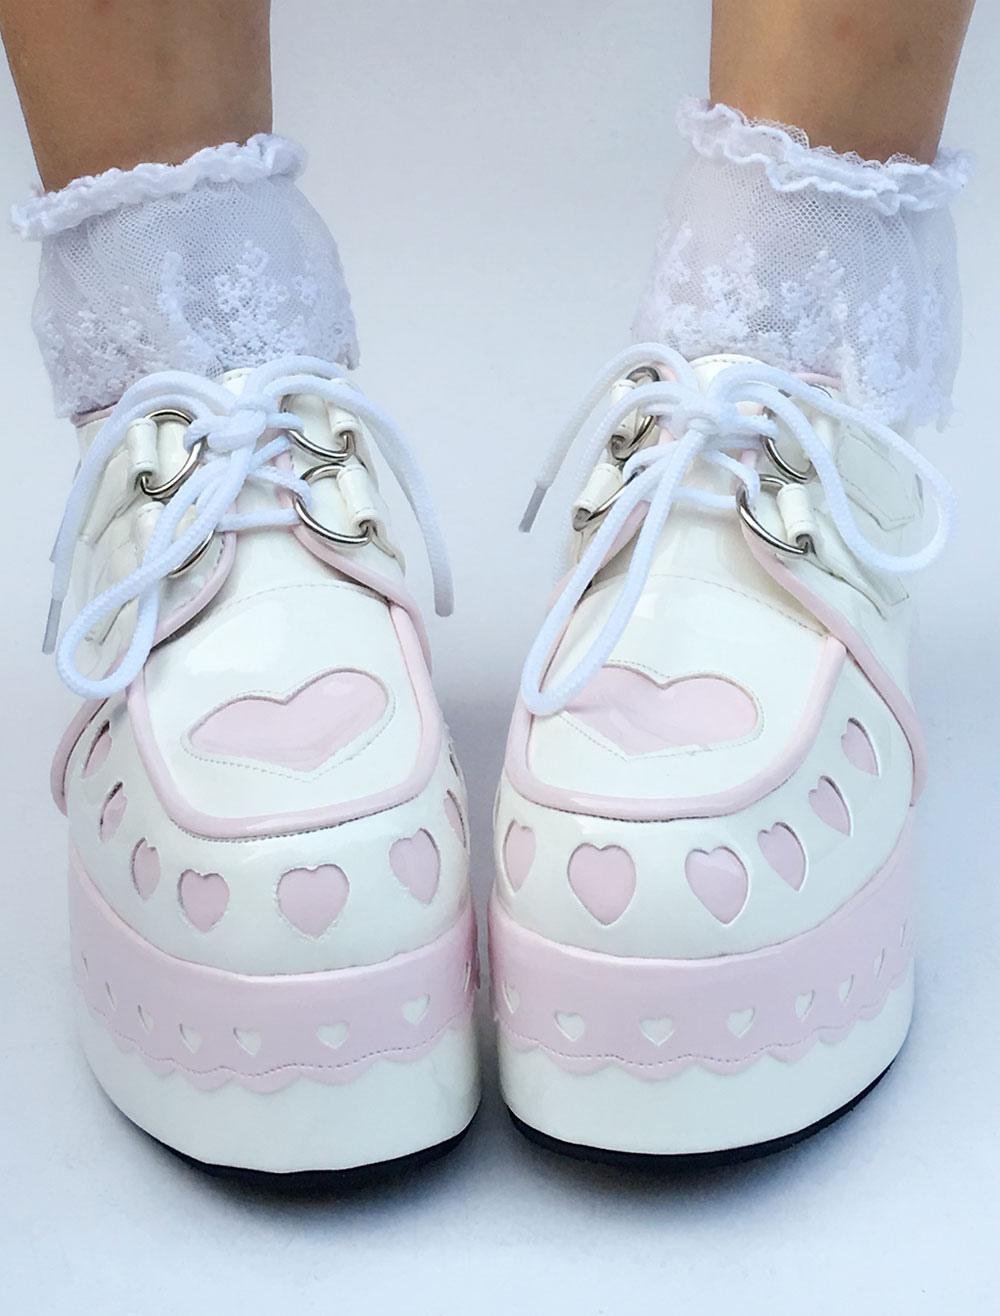 Sweet Lolita Shoes Platform Wedge Lace Up Heart Round Toe Lolita Footwear